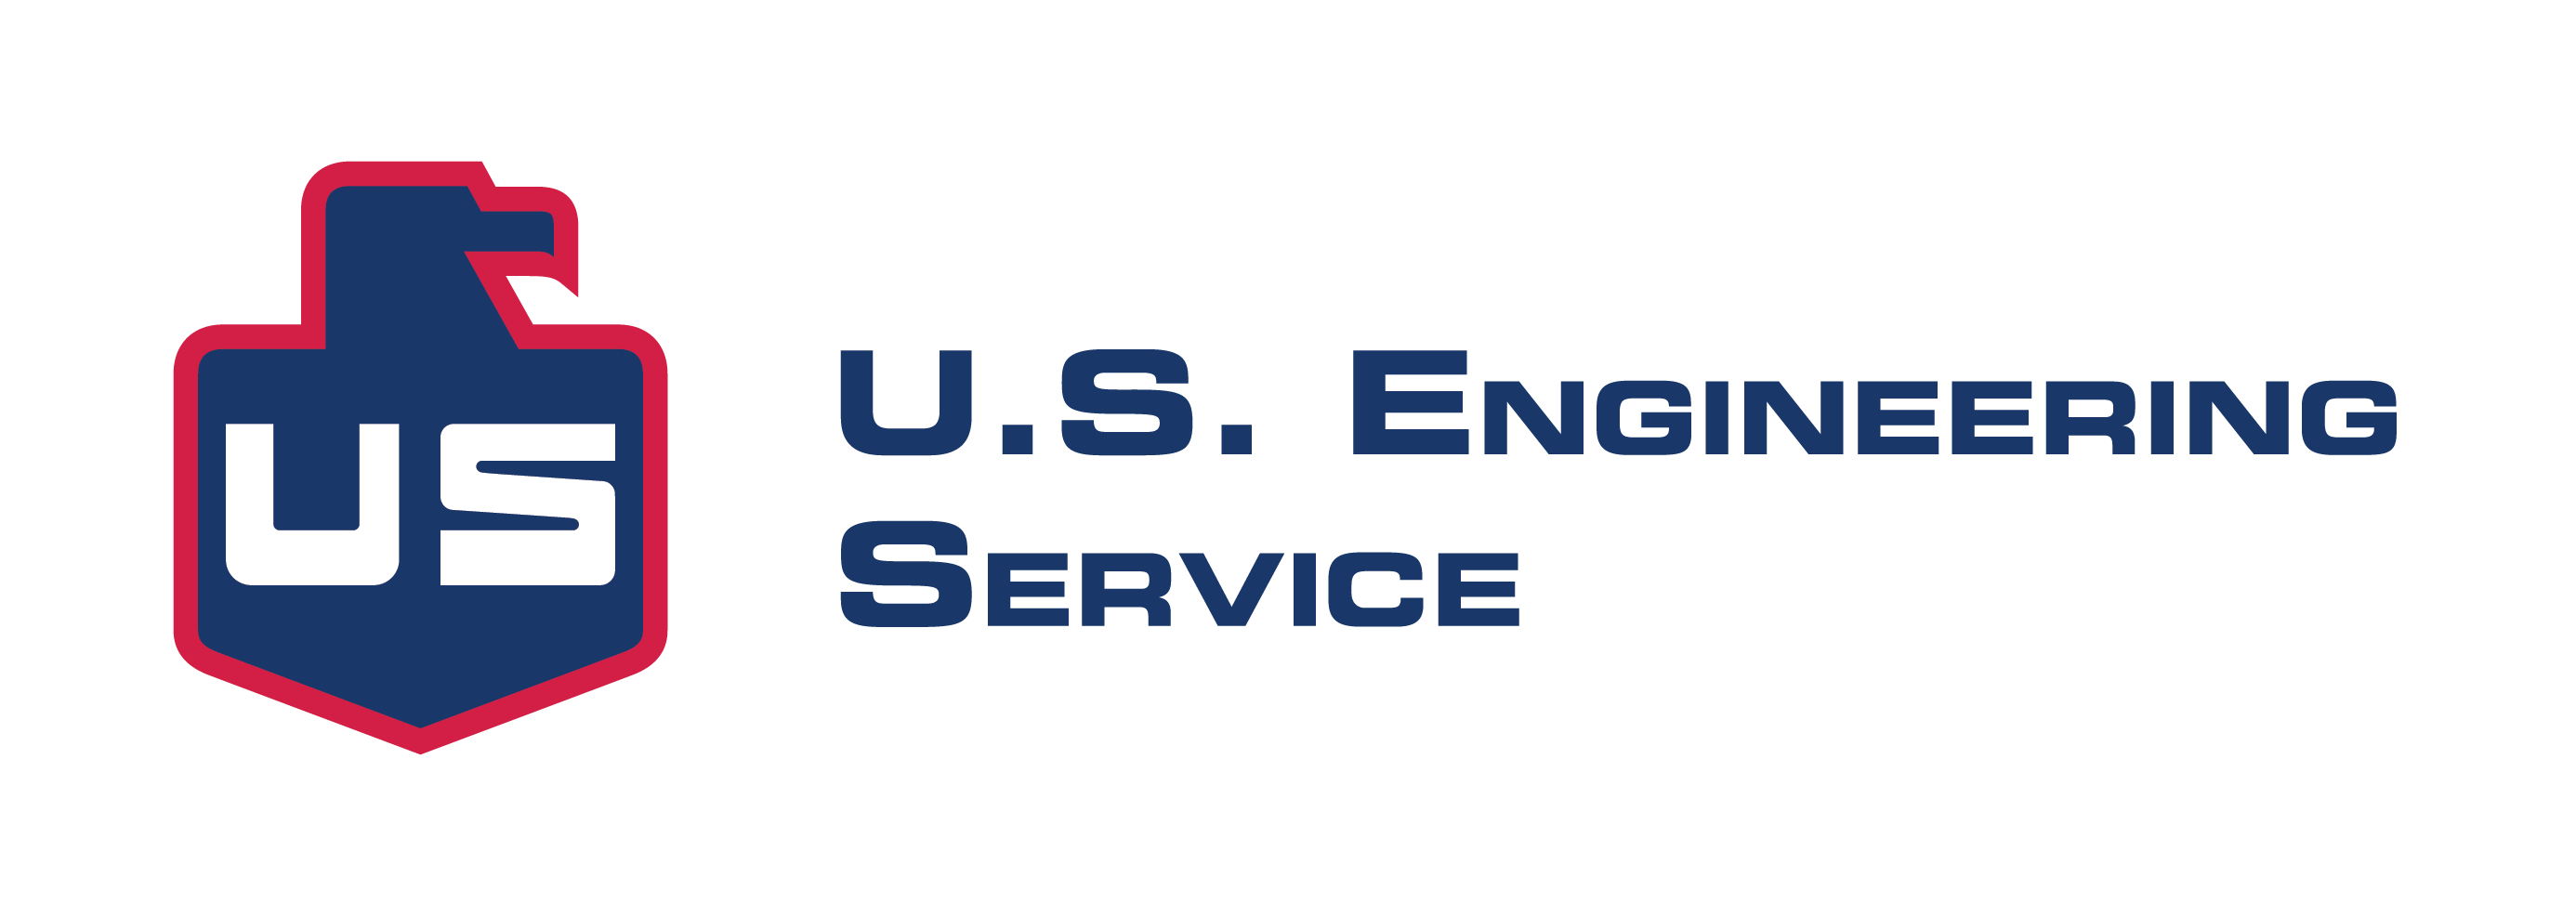 U.S. Engineering